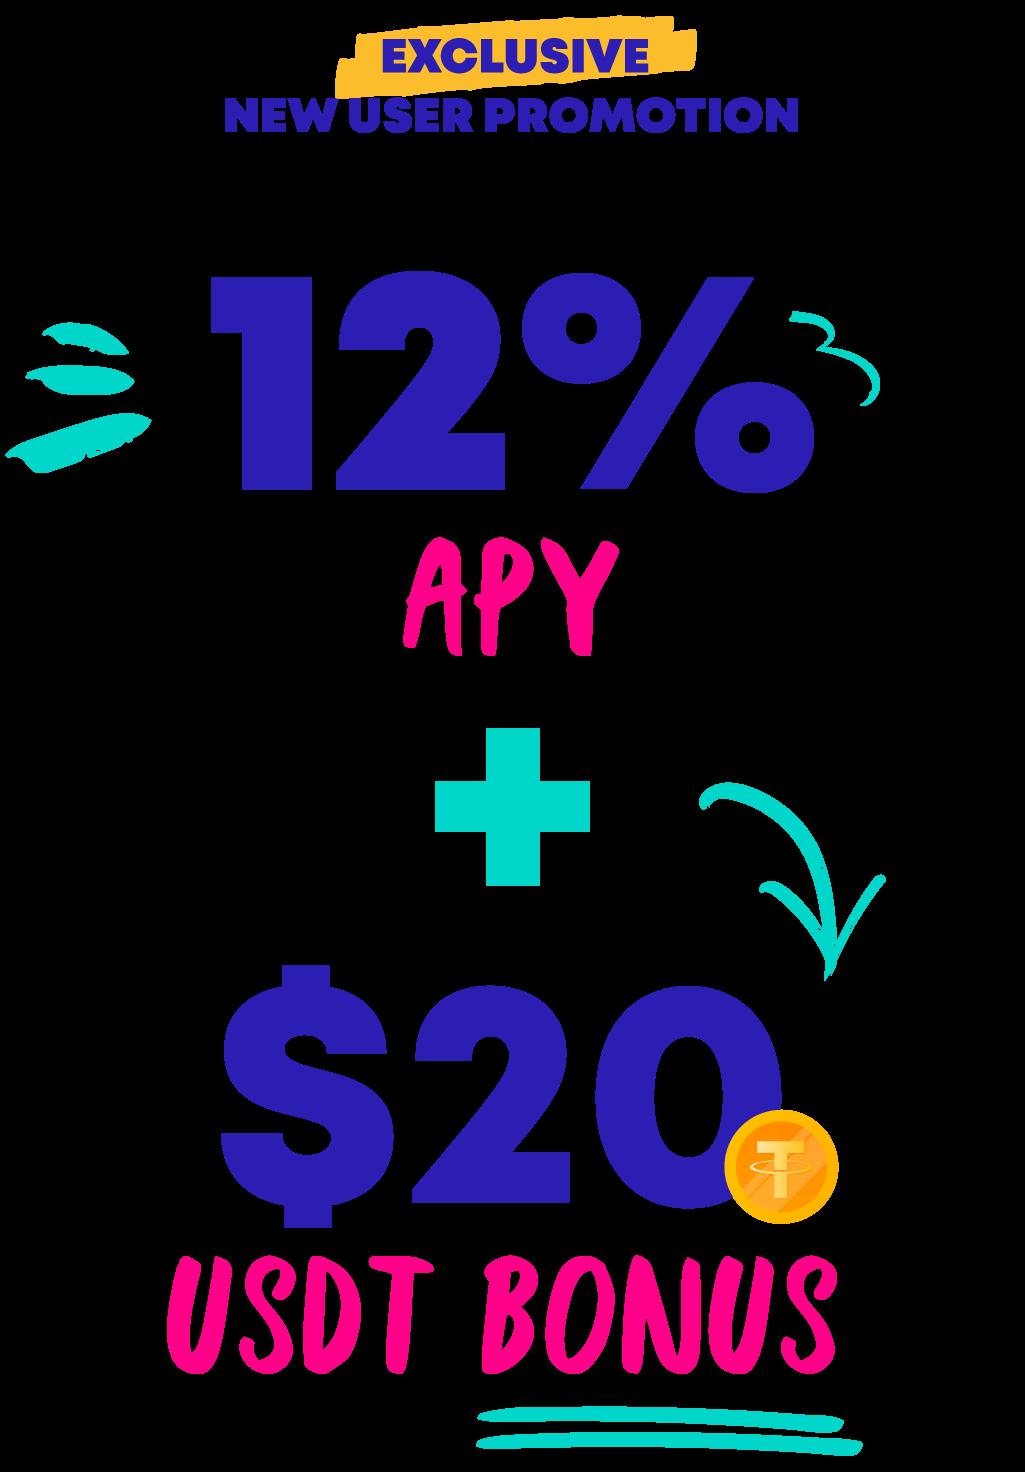 Exclusive New User Promotion: 12% APY + $20 USDT Bonus